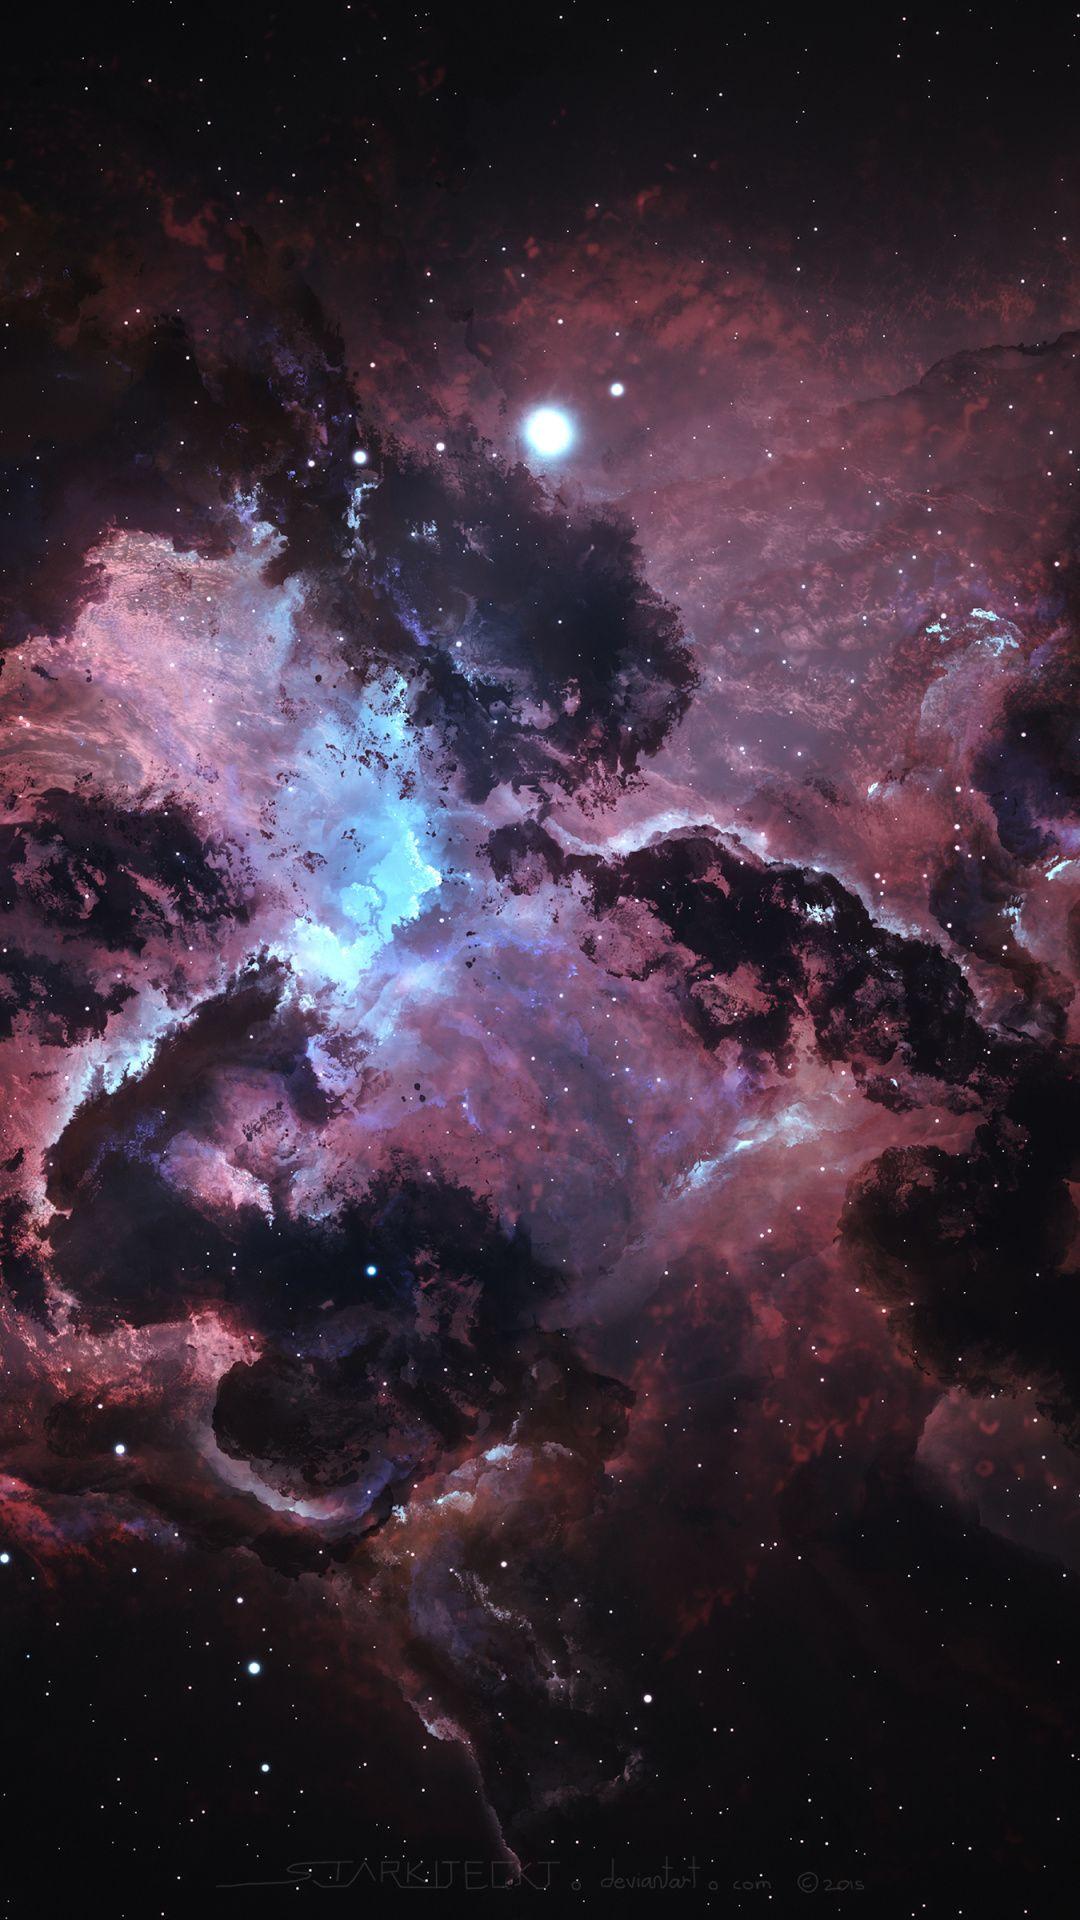 Nebula, dark, space, stars, clouds, art, 1080x1920 wallpaper